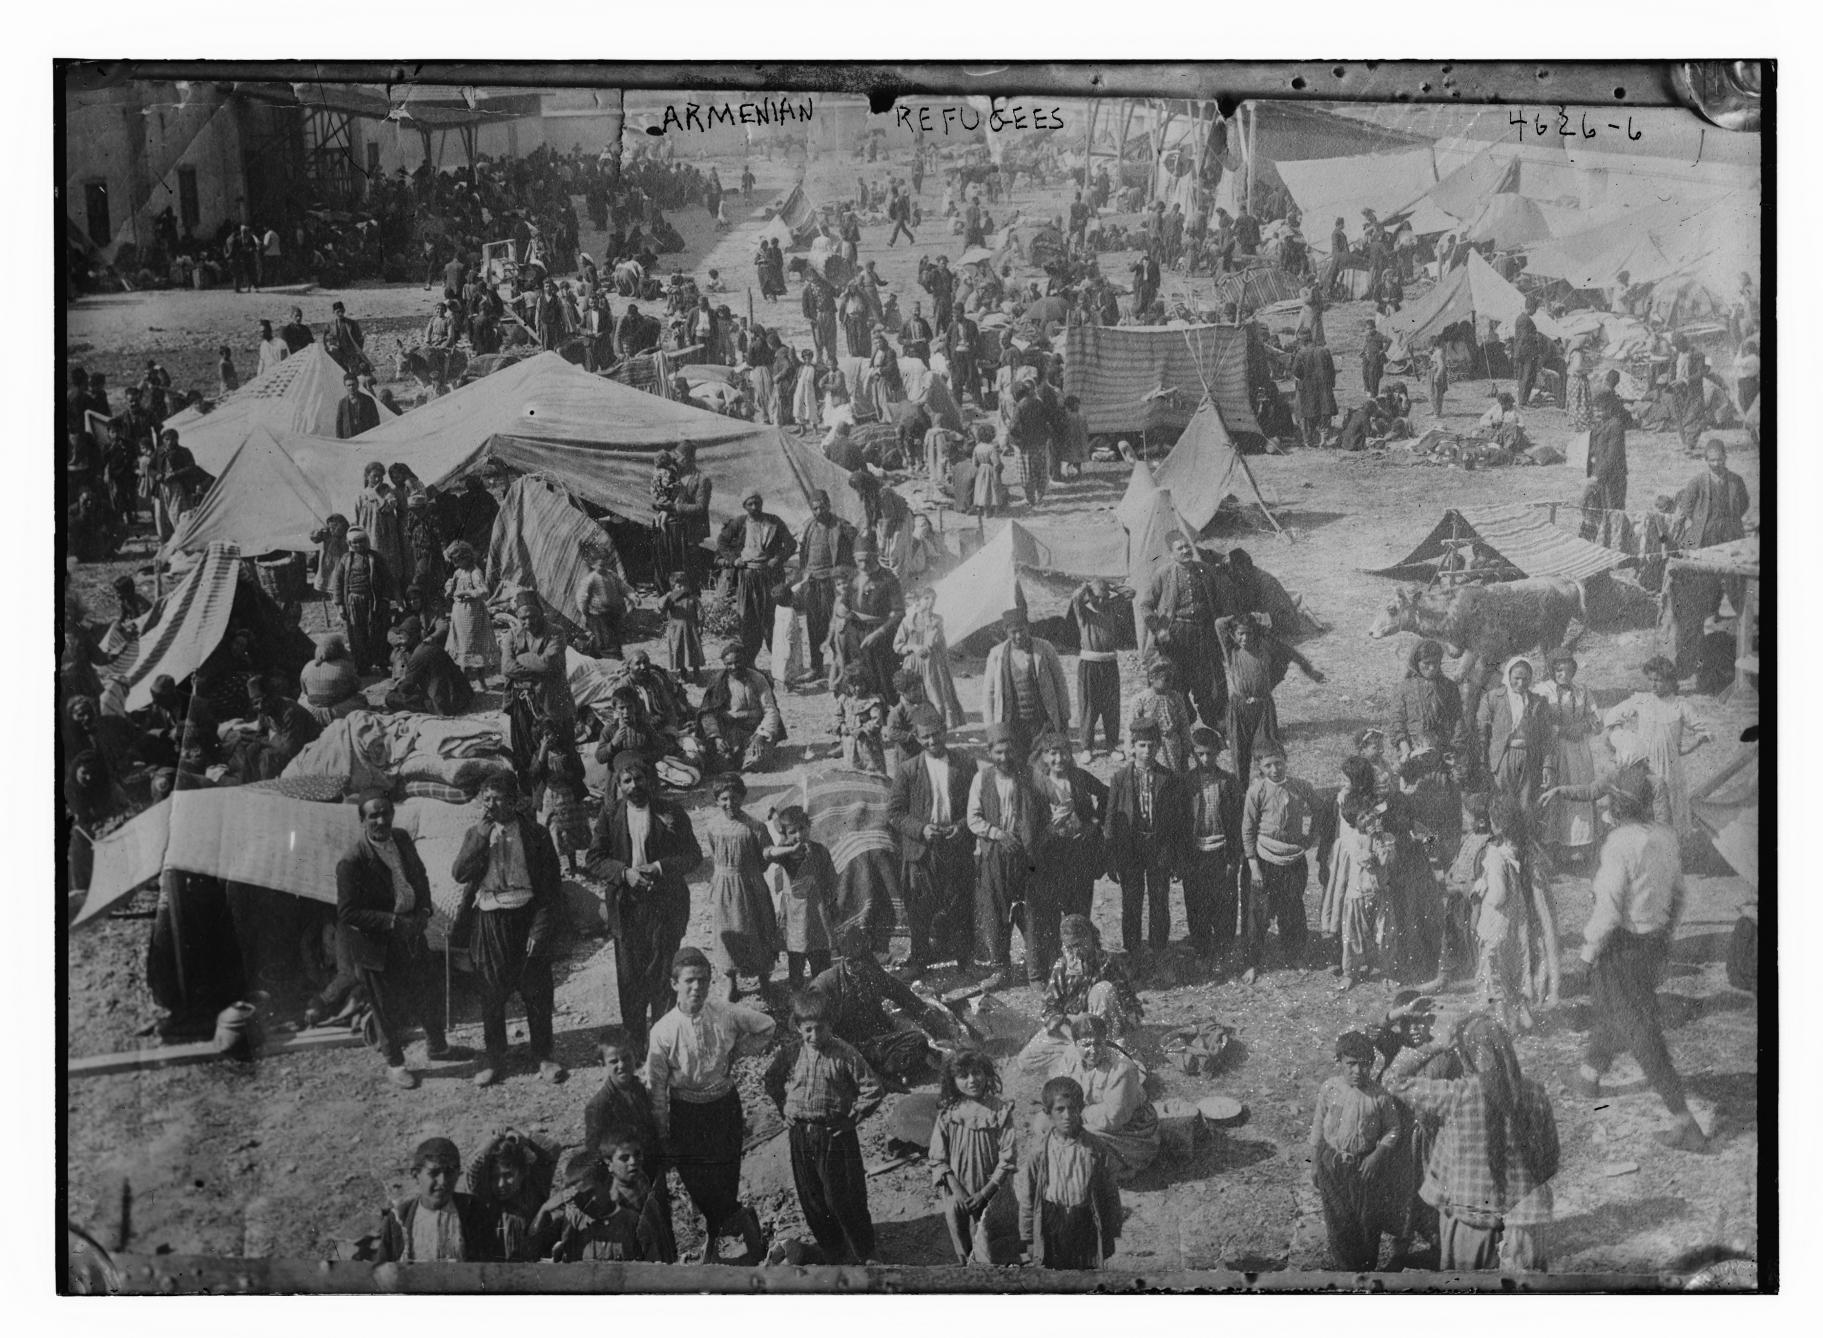 Армянские беженцы в Сирии. 1916